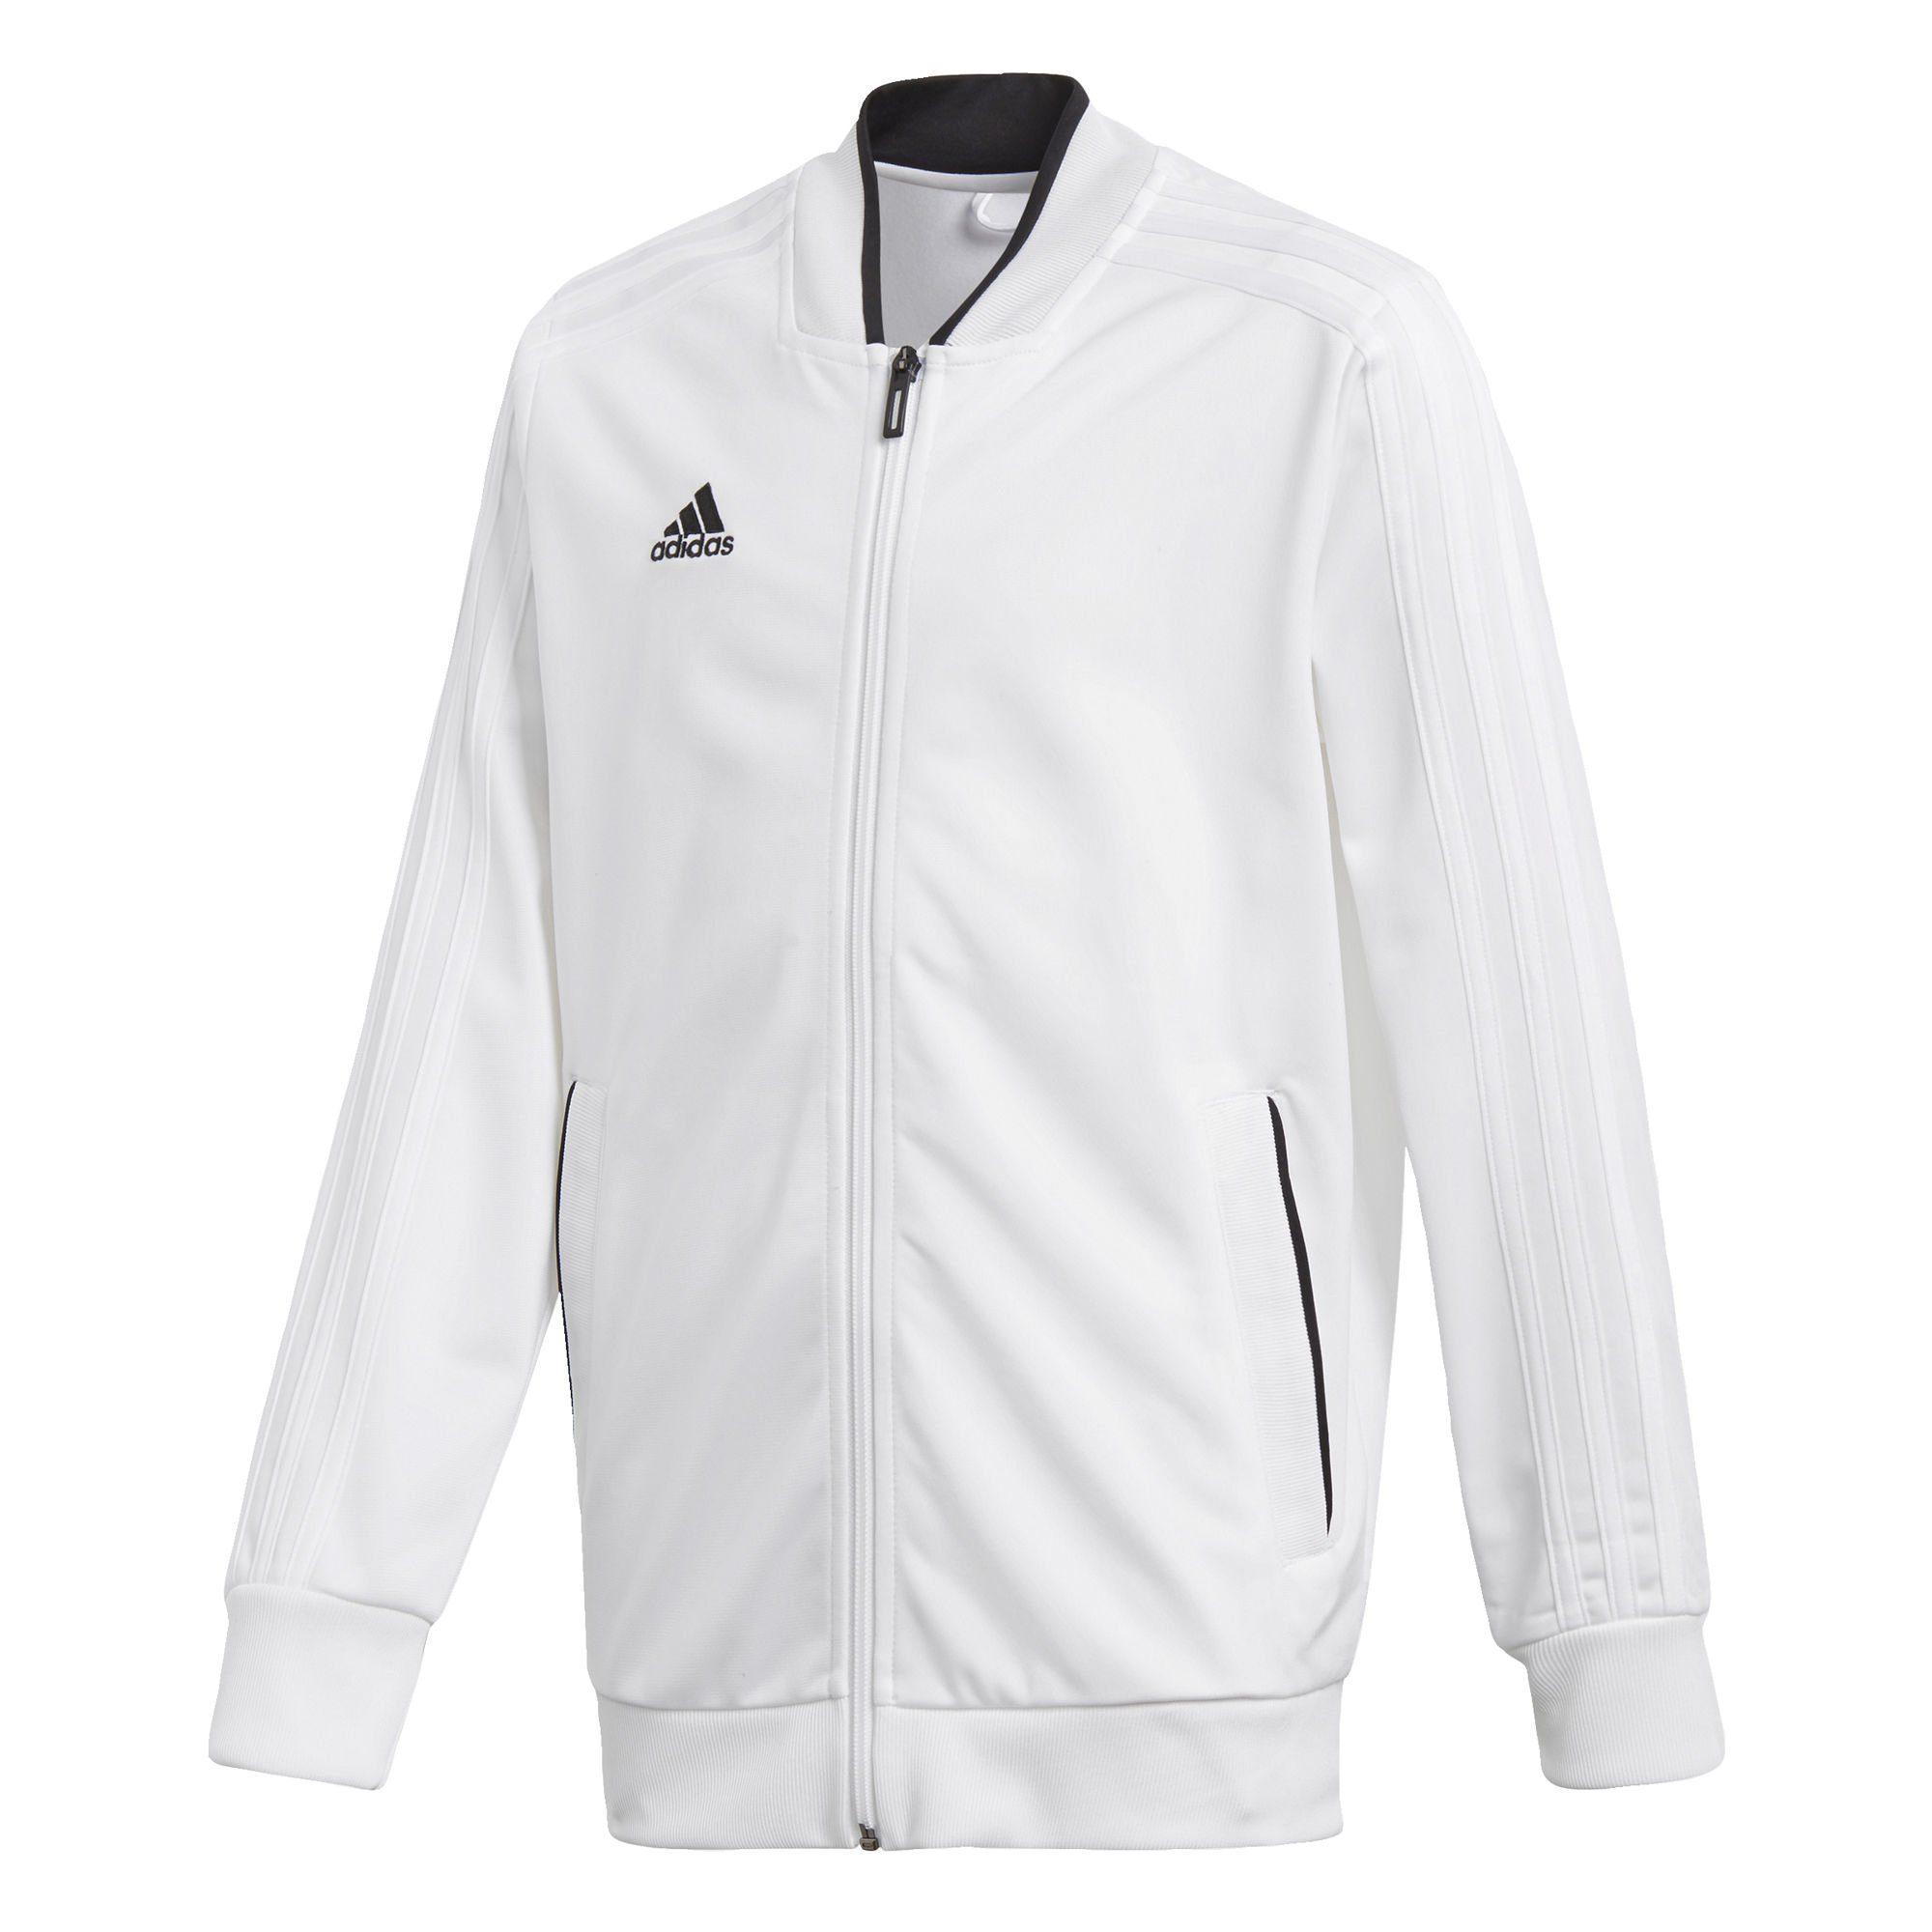 adidas Performance Sweatjacke »Condivo 18 Jacke« Teamwear;Teamwear;Condivo online kaufen | OTTO